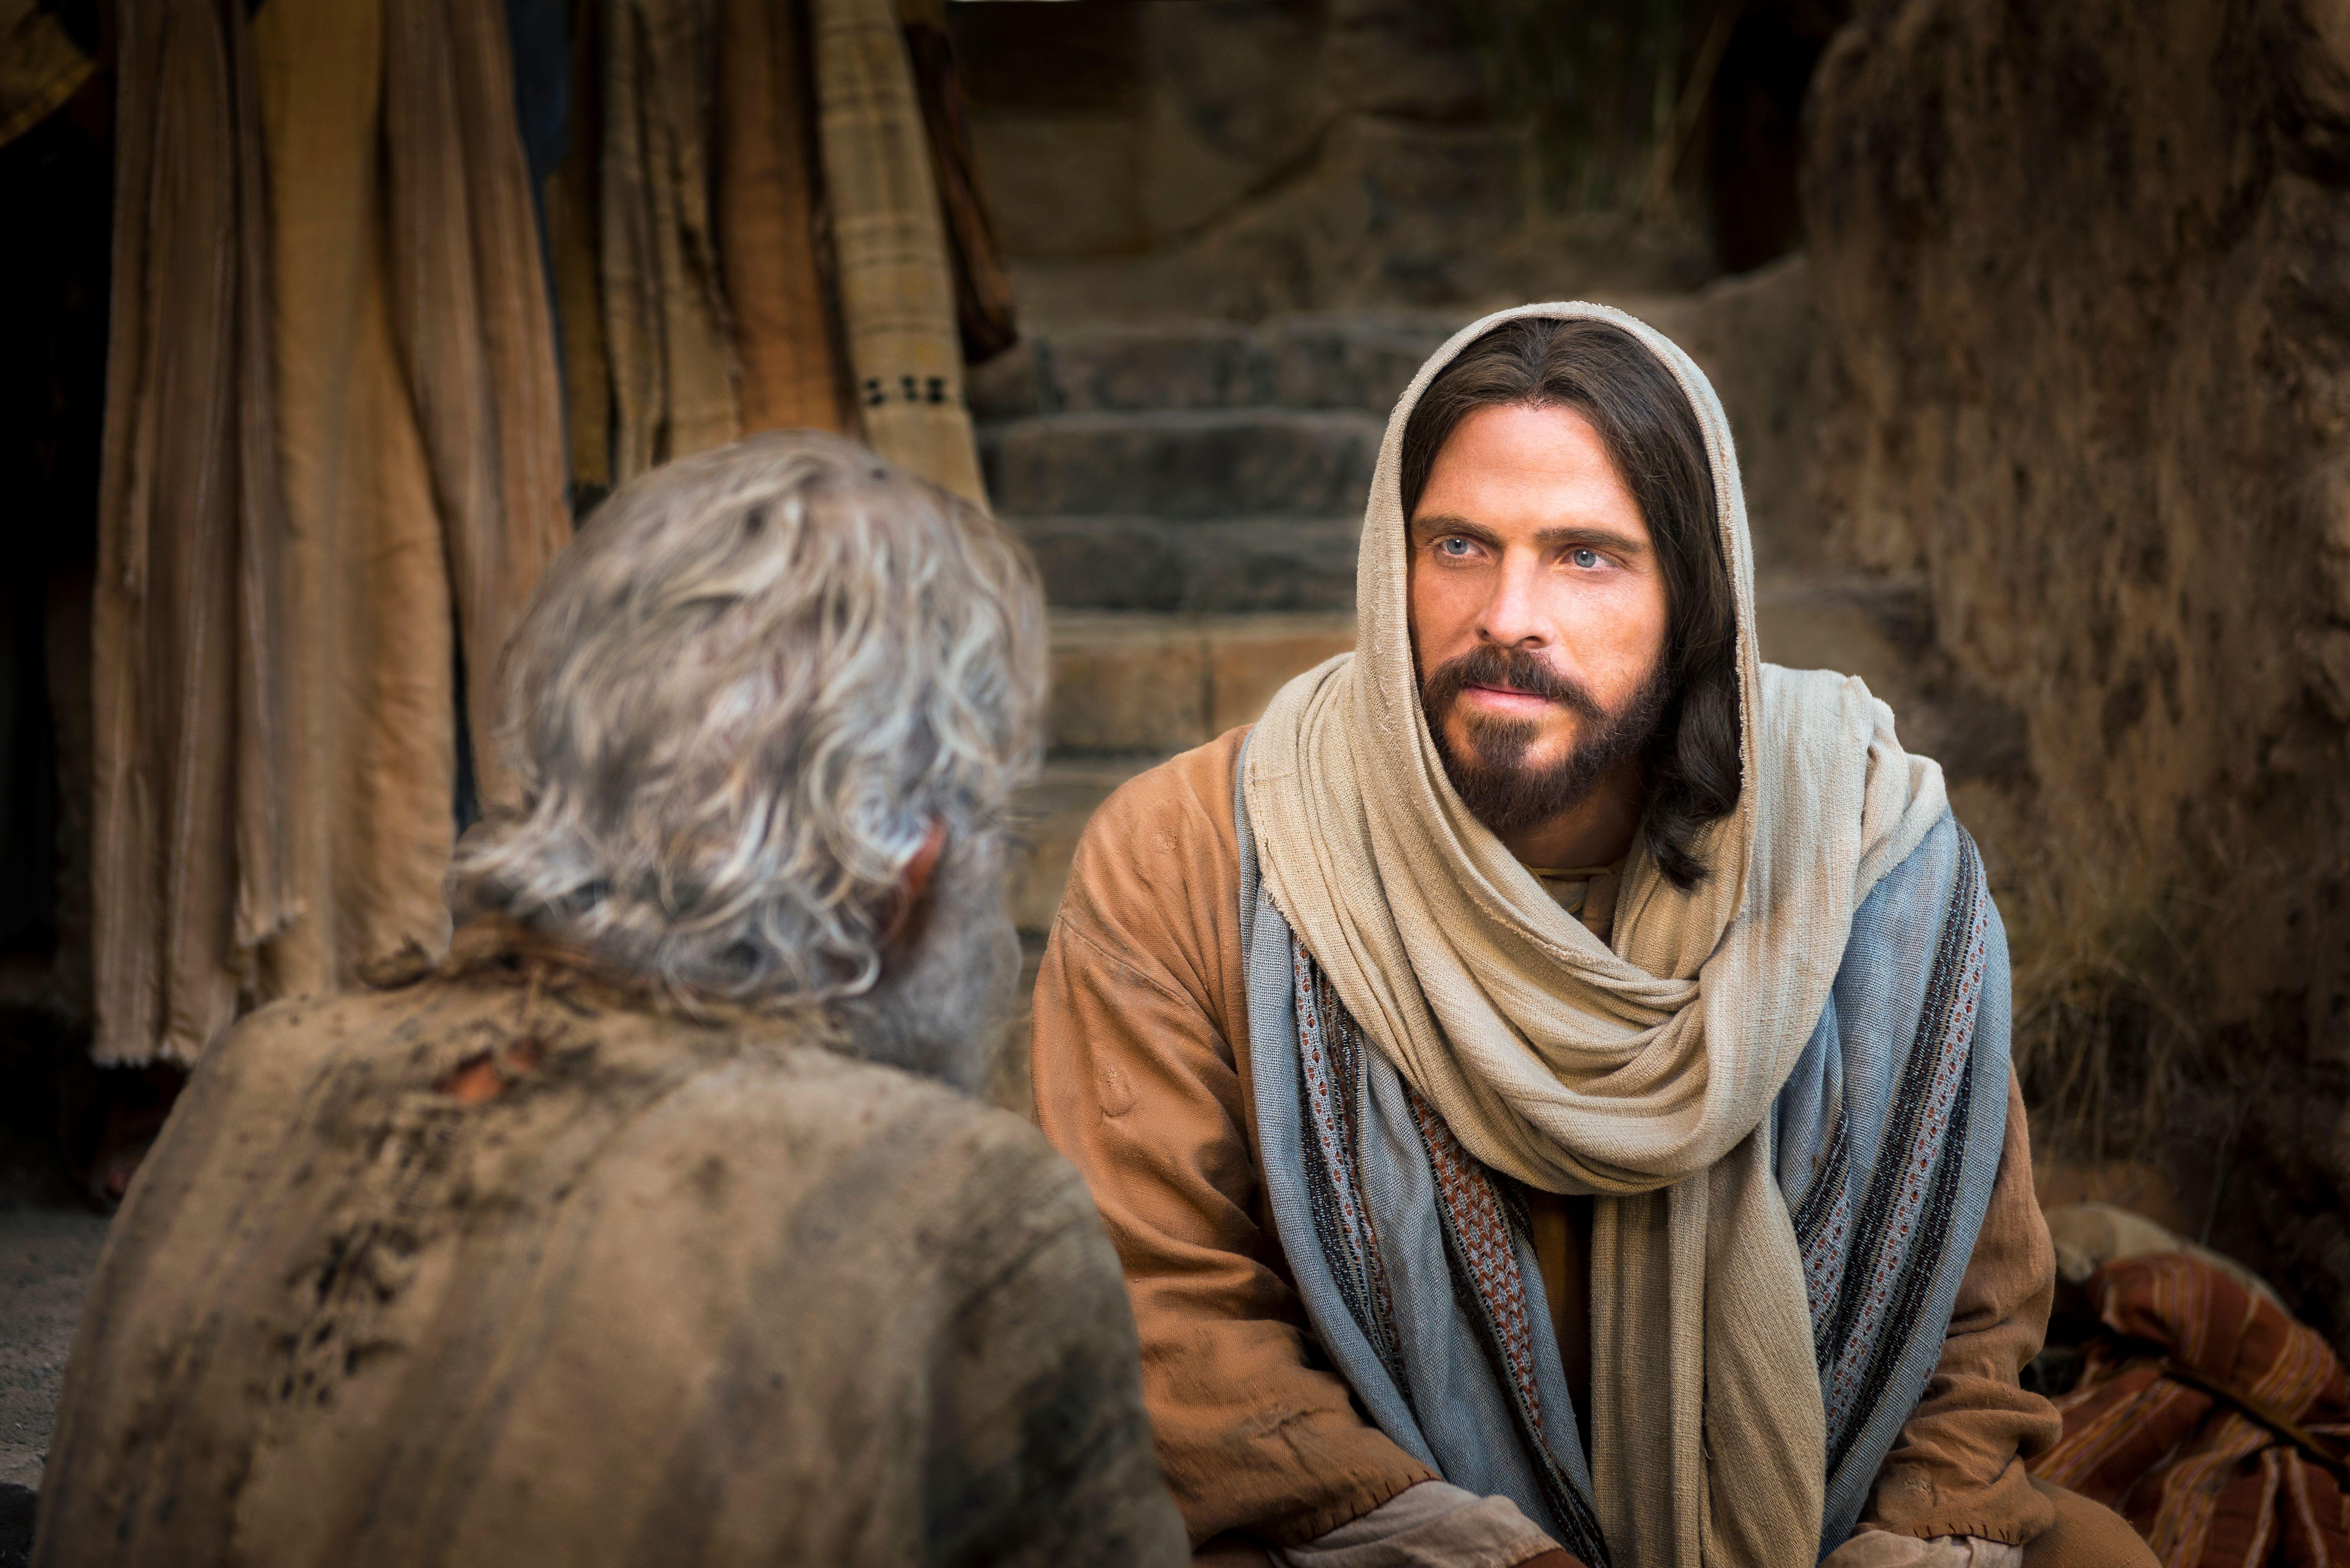 Christ sitting beside a man and healing him.